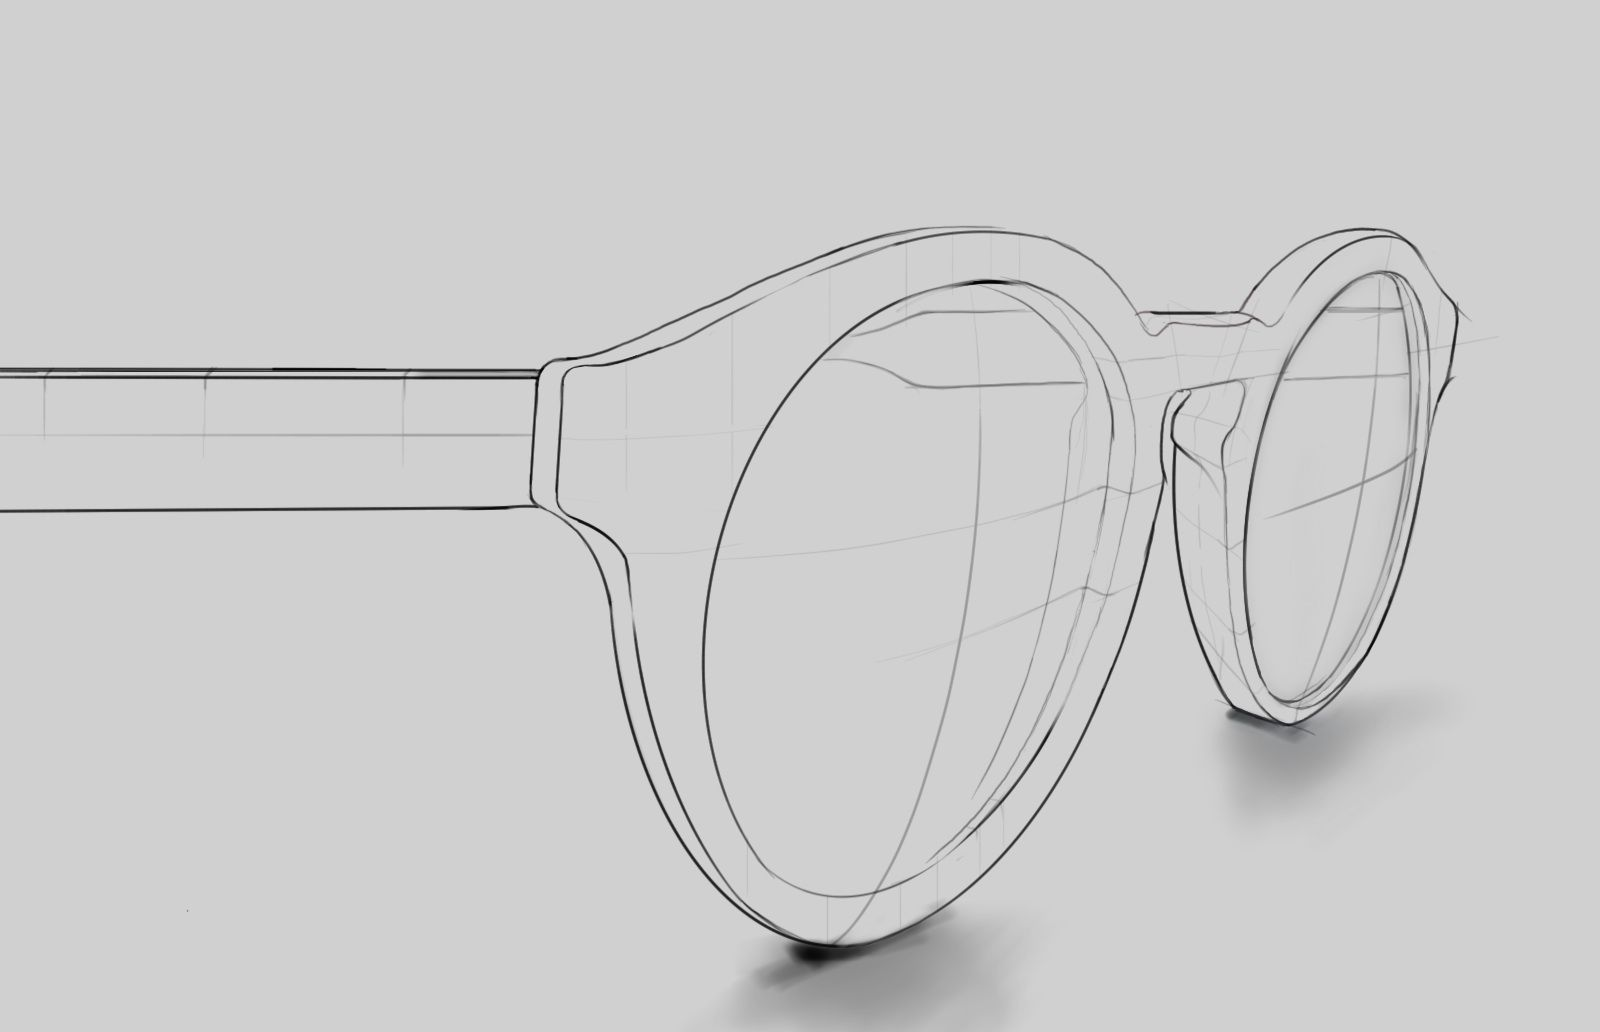 Sunglasses sketch